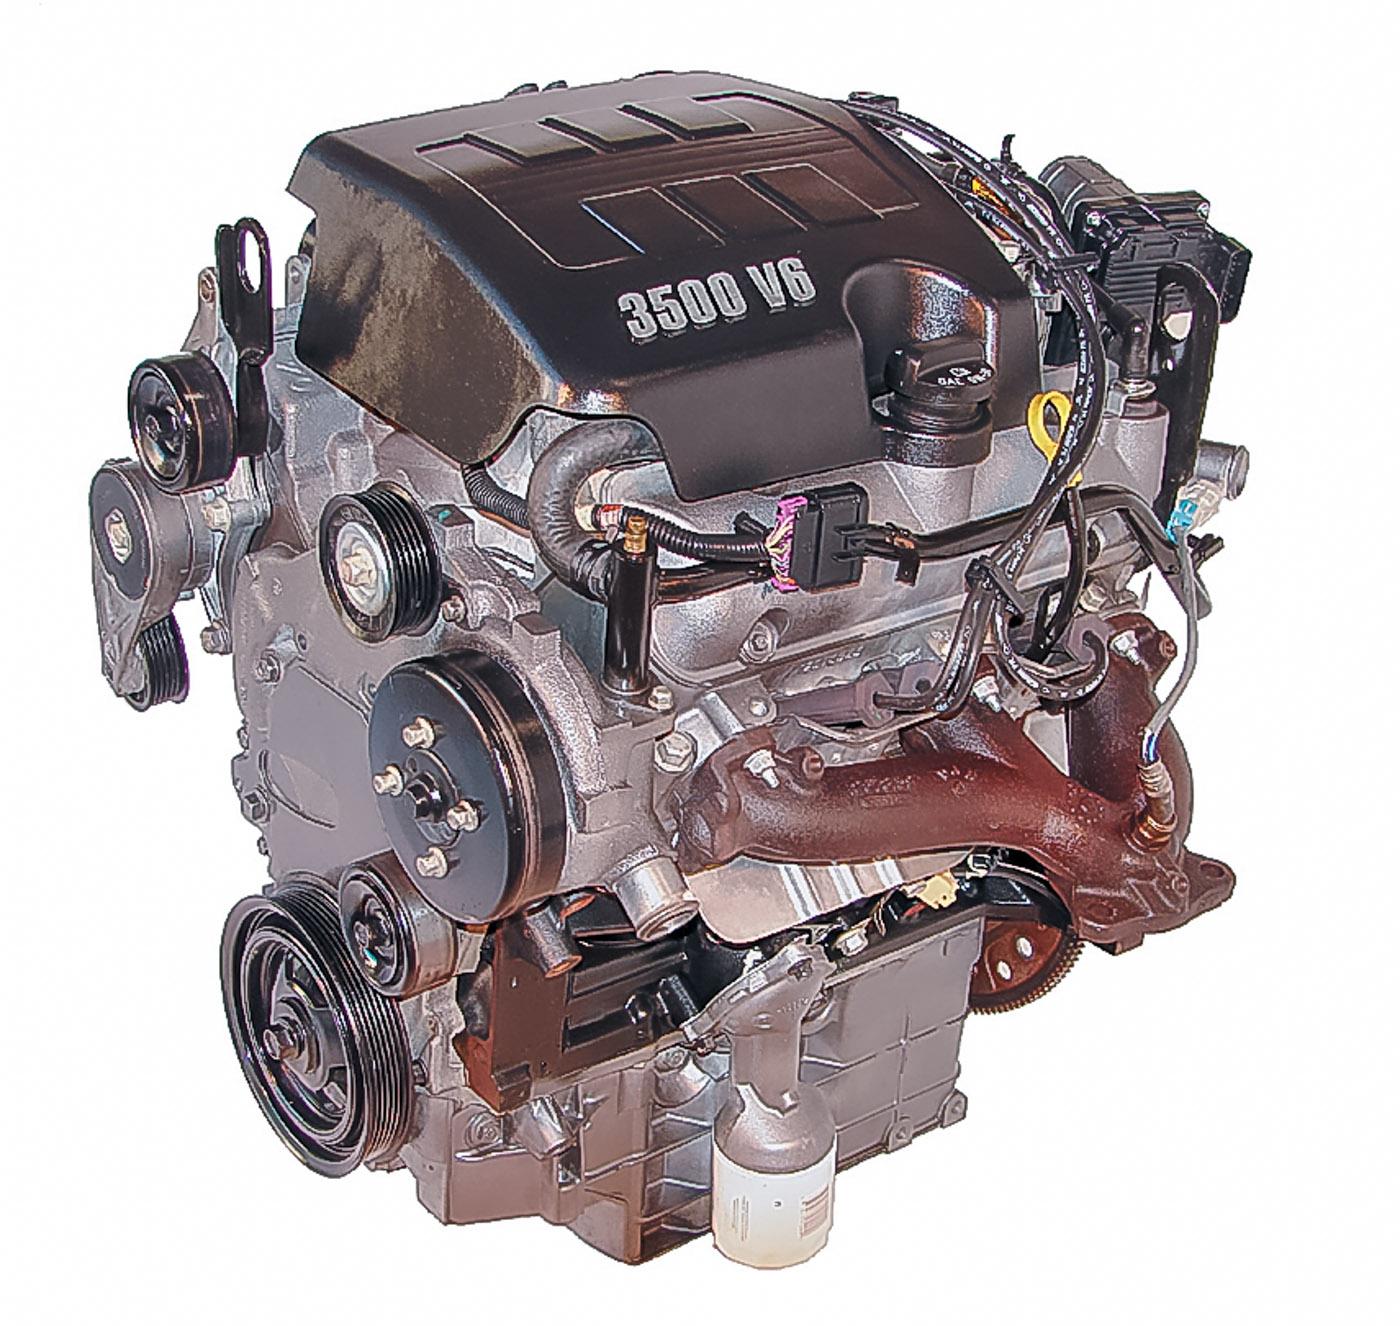 hight resolution of 2000 chevy impala 3 4 engine diagram chevy venture 3 4 chevy 3400 engine diagram 95